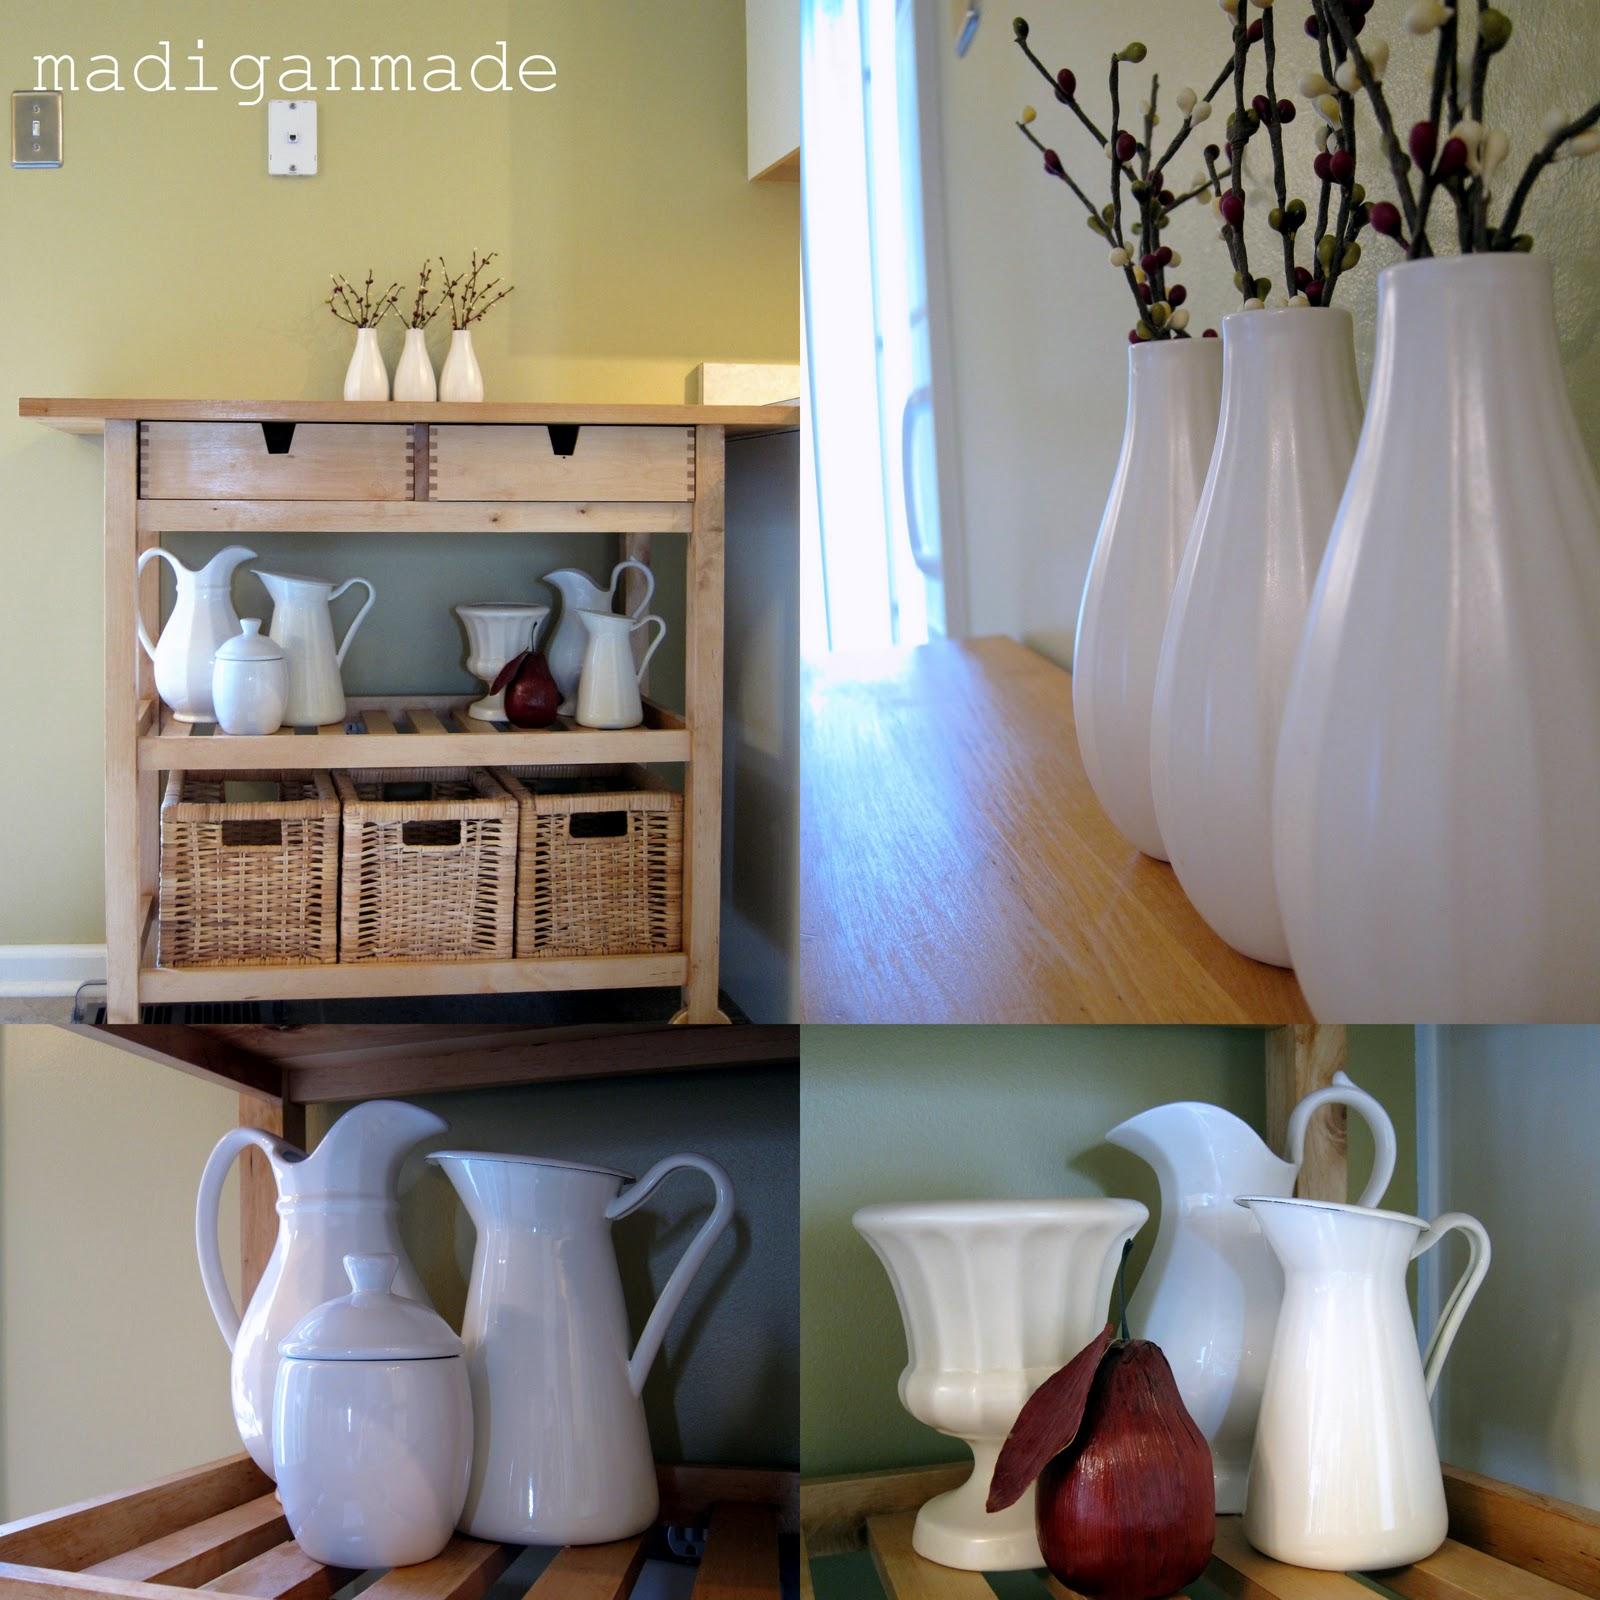 https://i2.wp.com/4.bp.blogspot.com/_xd5aEjCcjL4/TSCerHj51mI/AAAAAAAABVY/1UmOjYhWb7w/s1600/pottery.jpg?resize=533%2C533